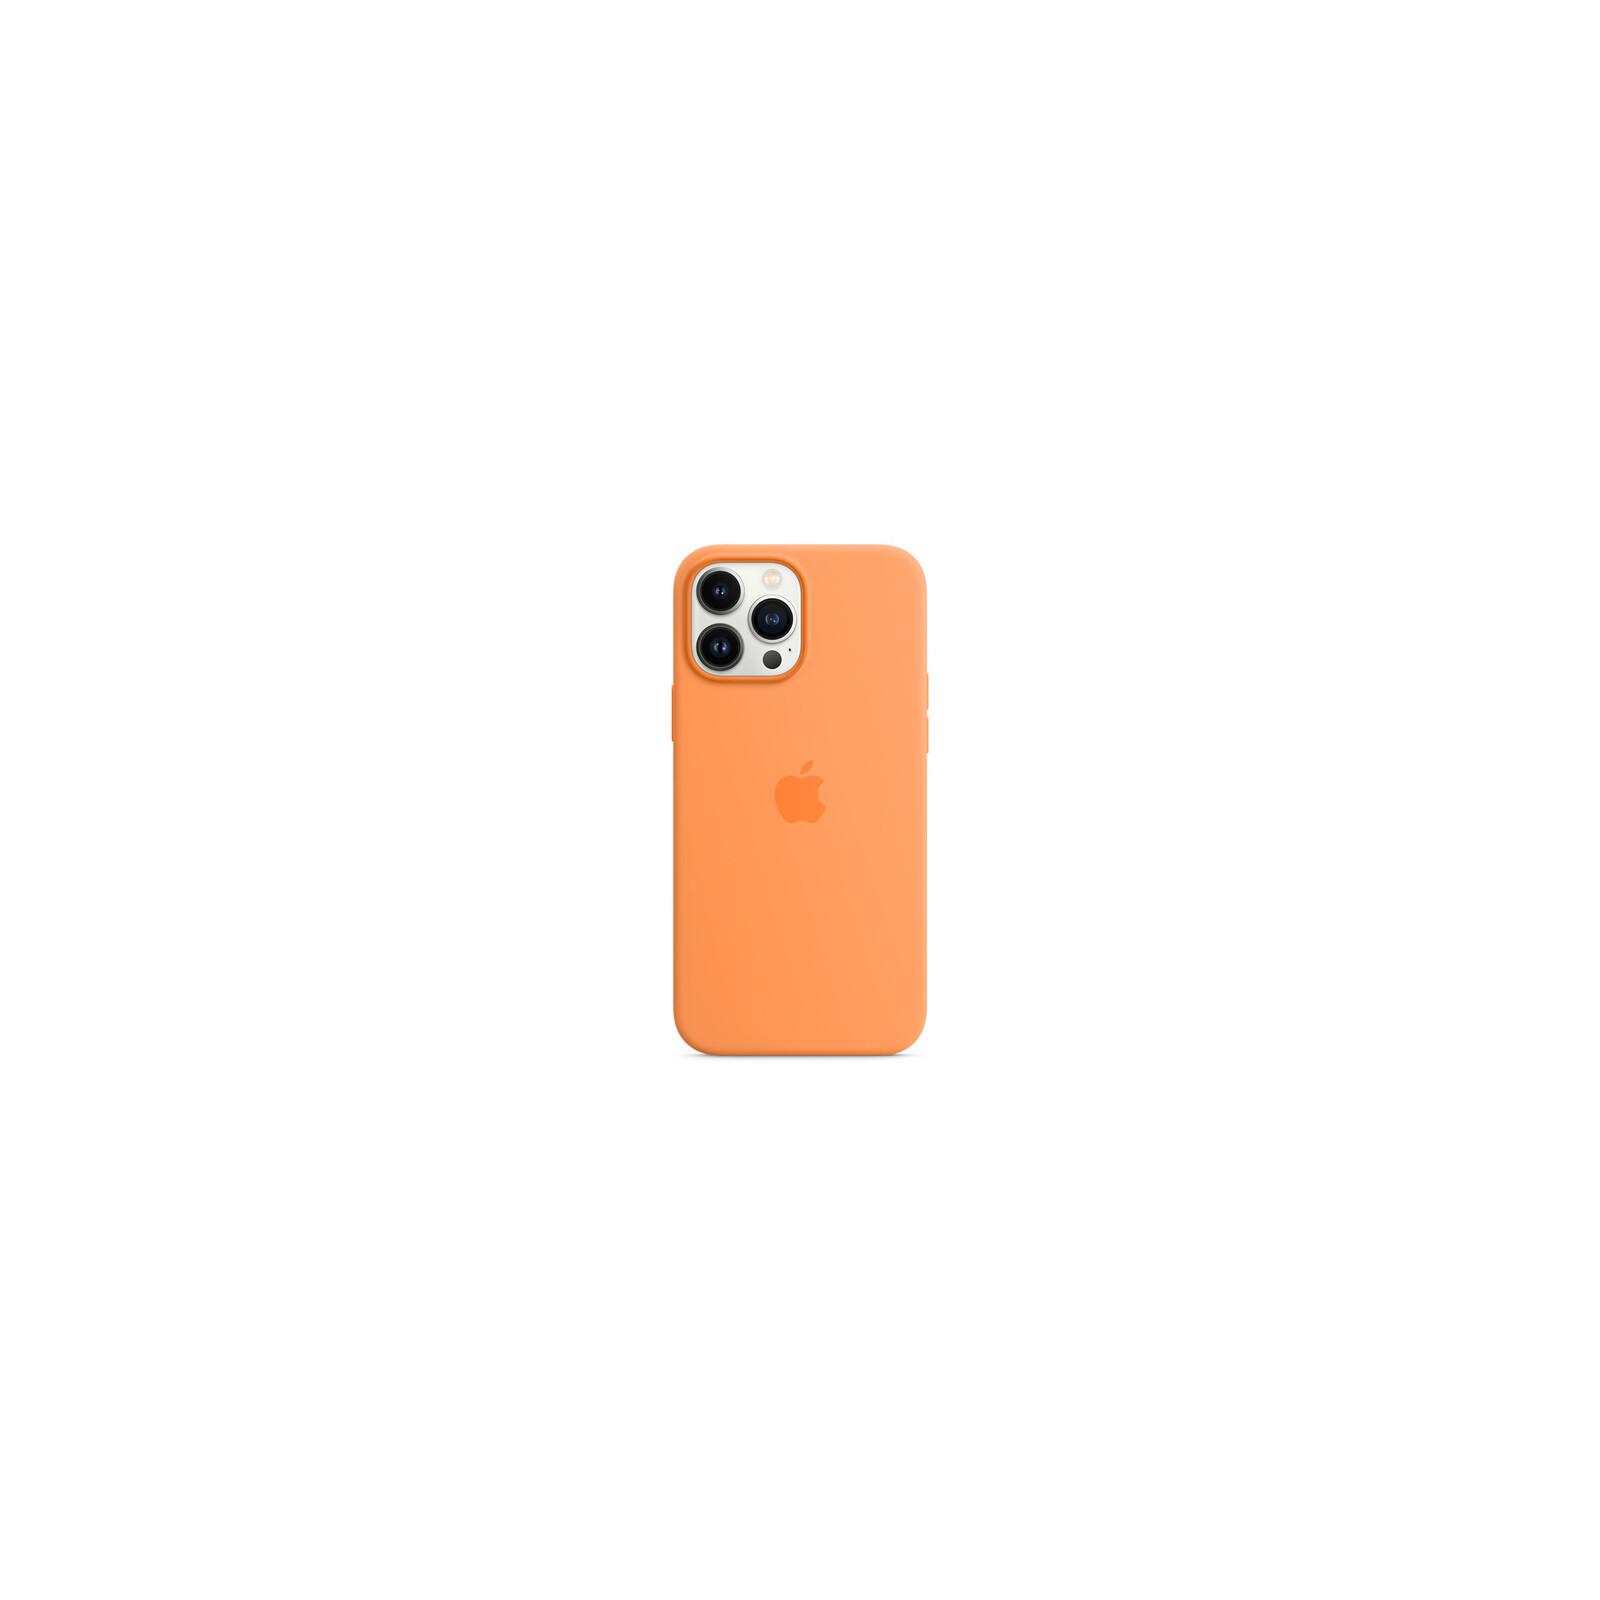 Apple iPhone 13 Pro Max Silikon Case mit MagSage gelborange